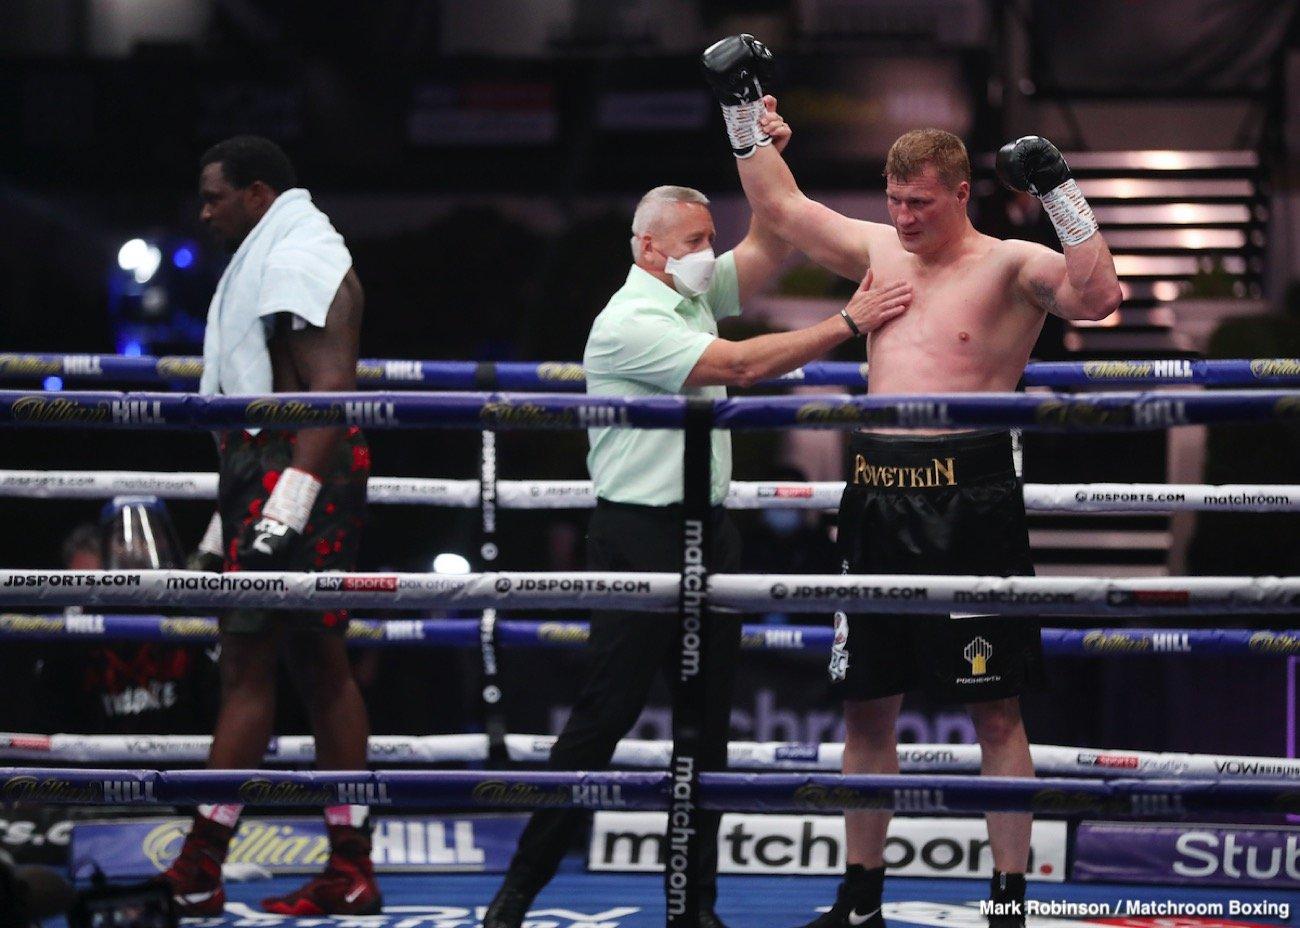 Alexander Povetkin - Boxing News